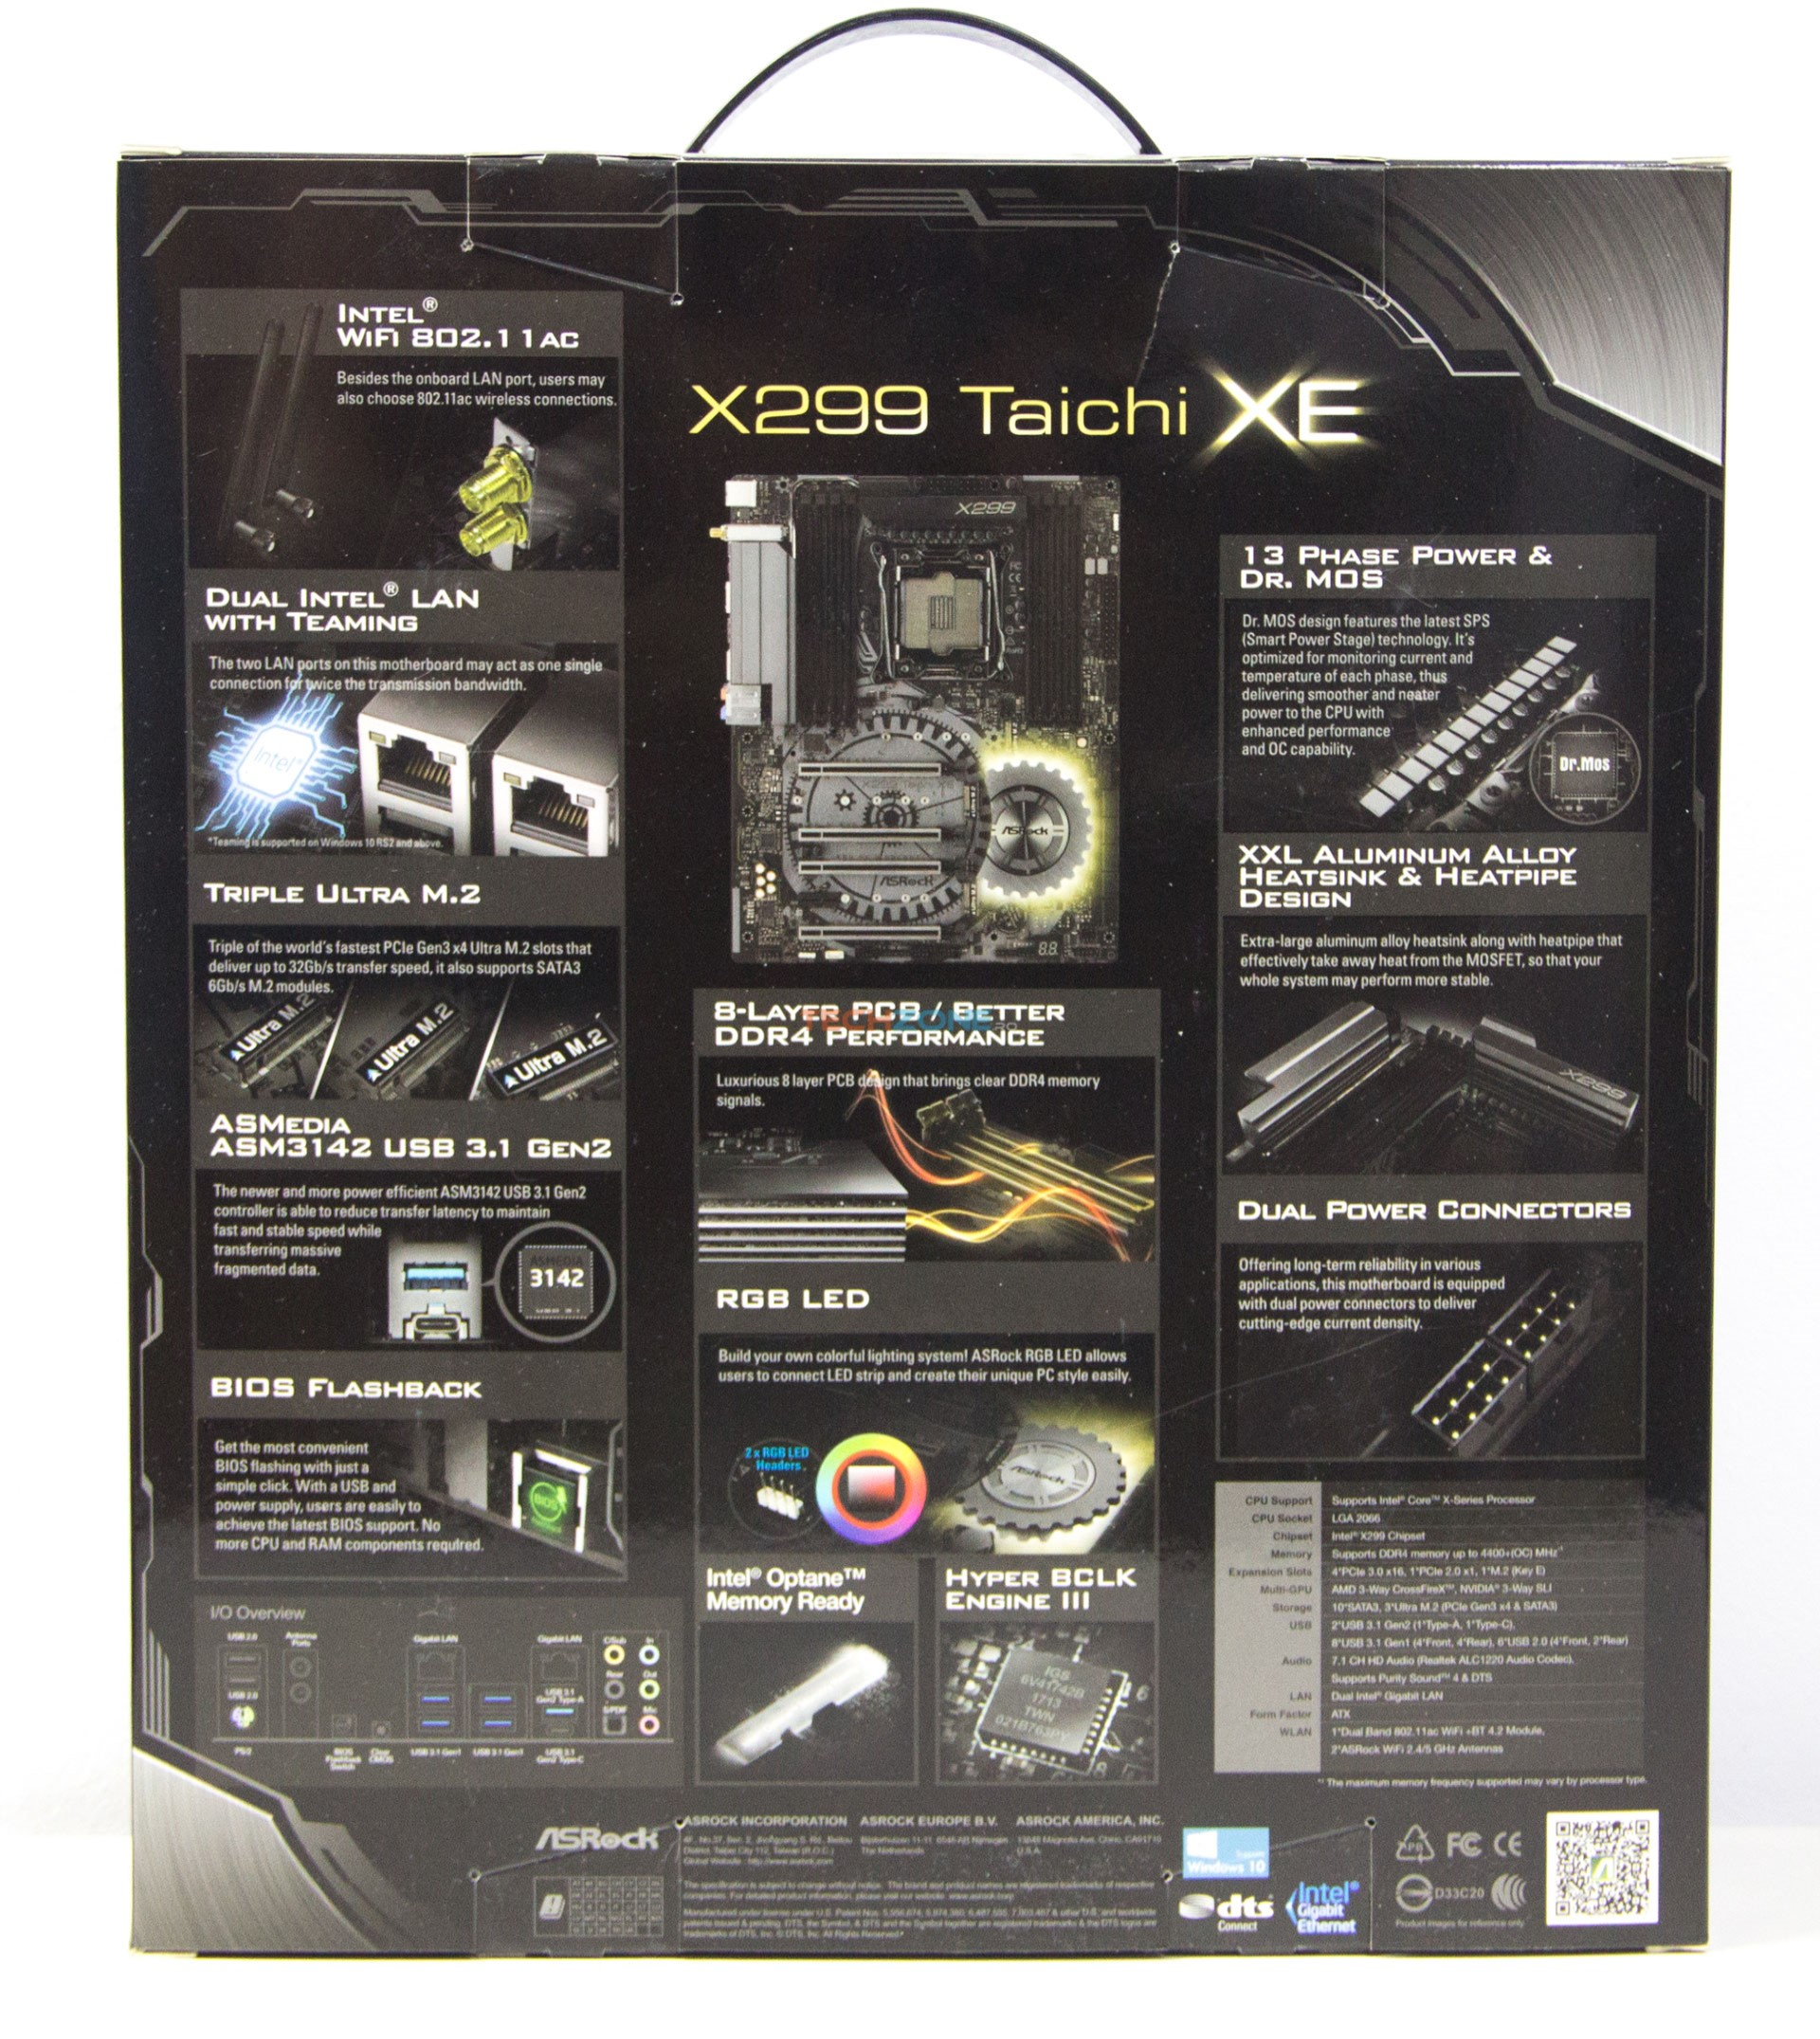 ASRock X299 Taichi XE box back